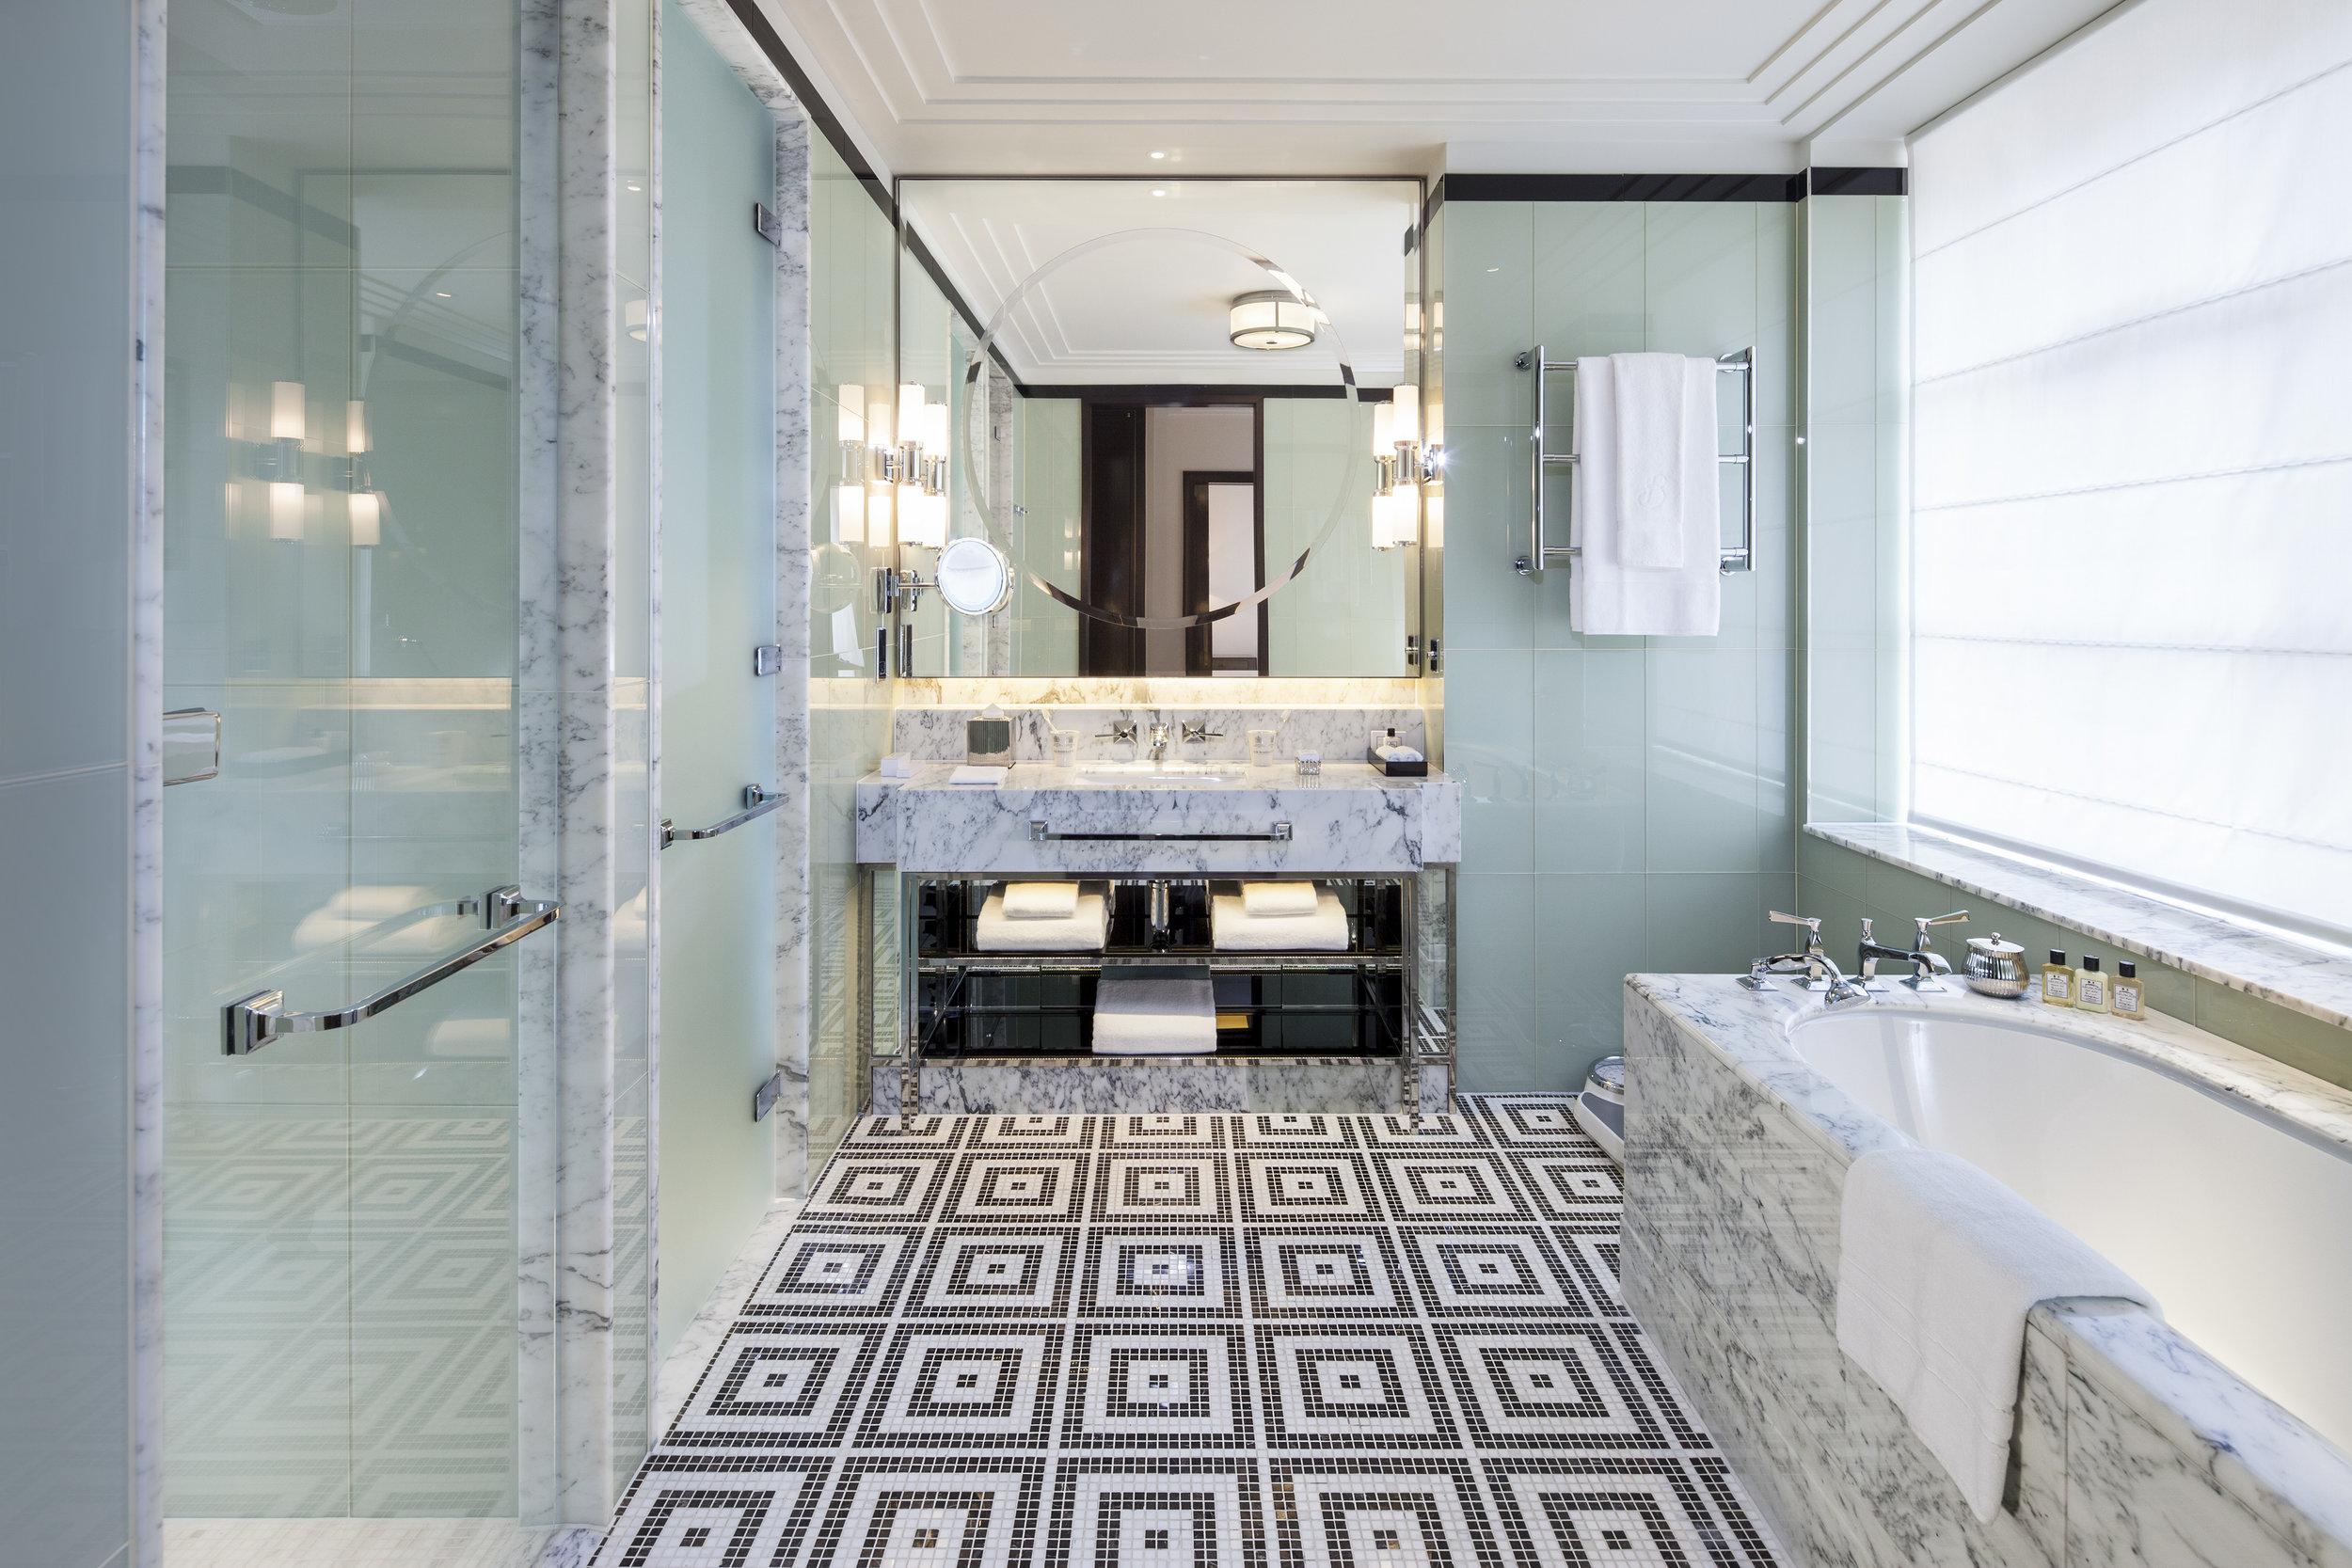 The spacious, divine bathrooms...